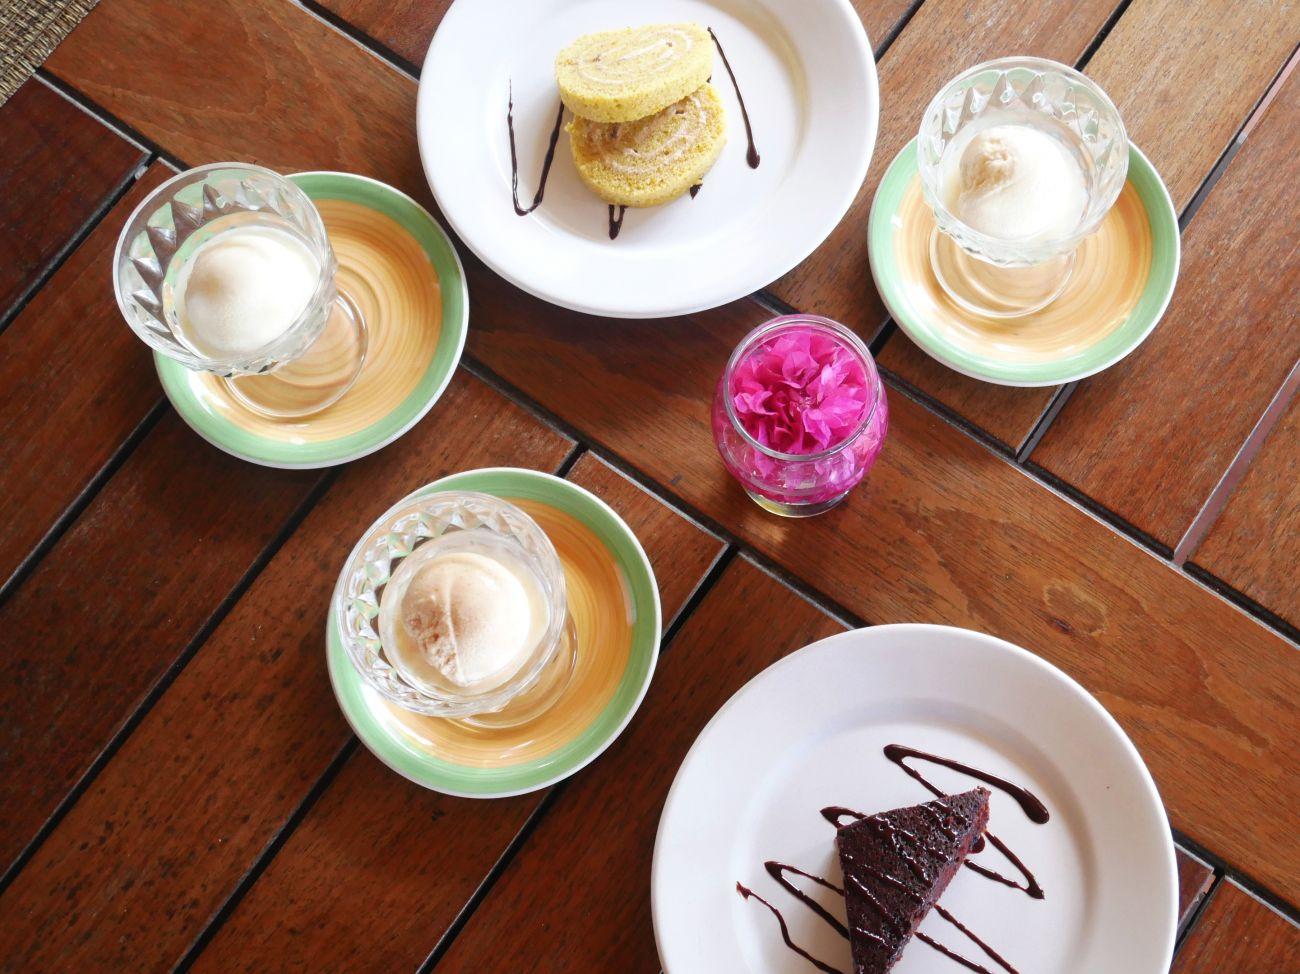 Desserts at Belmont Estate